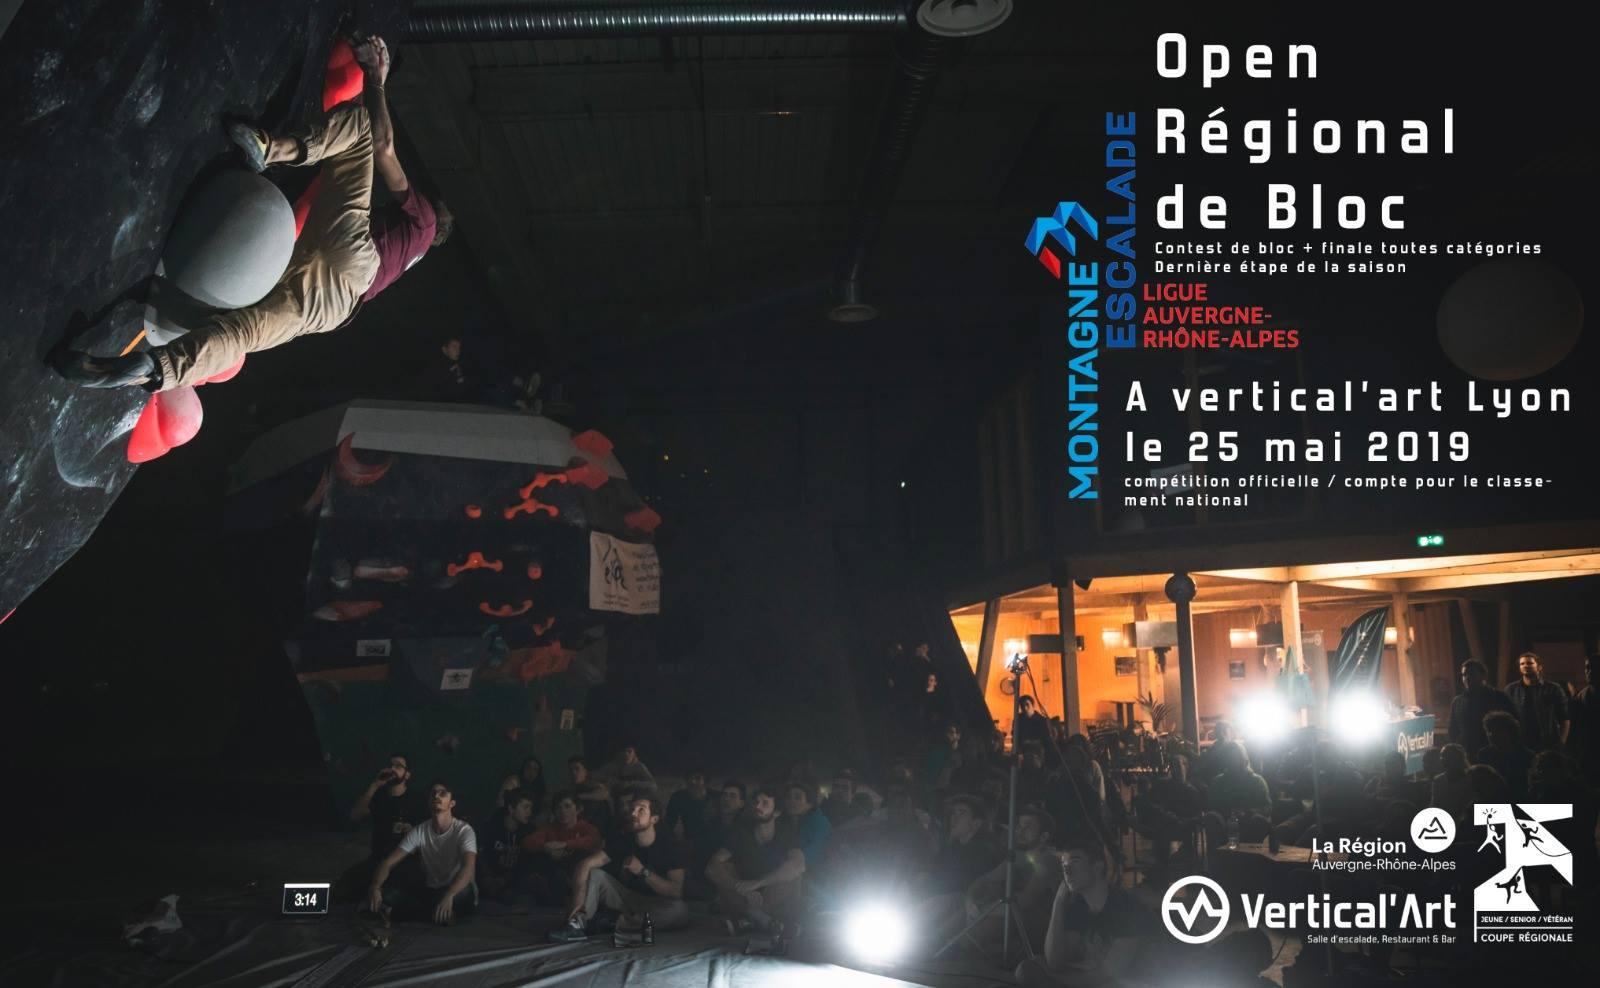 open regional de bloc - FFME -Vertical'art- Vertical'art lyon - salle d'escalade de bloc - restaurant- bar